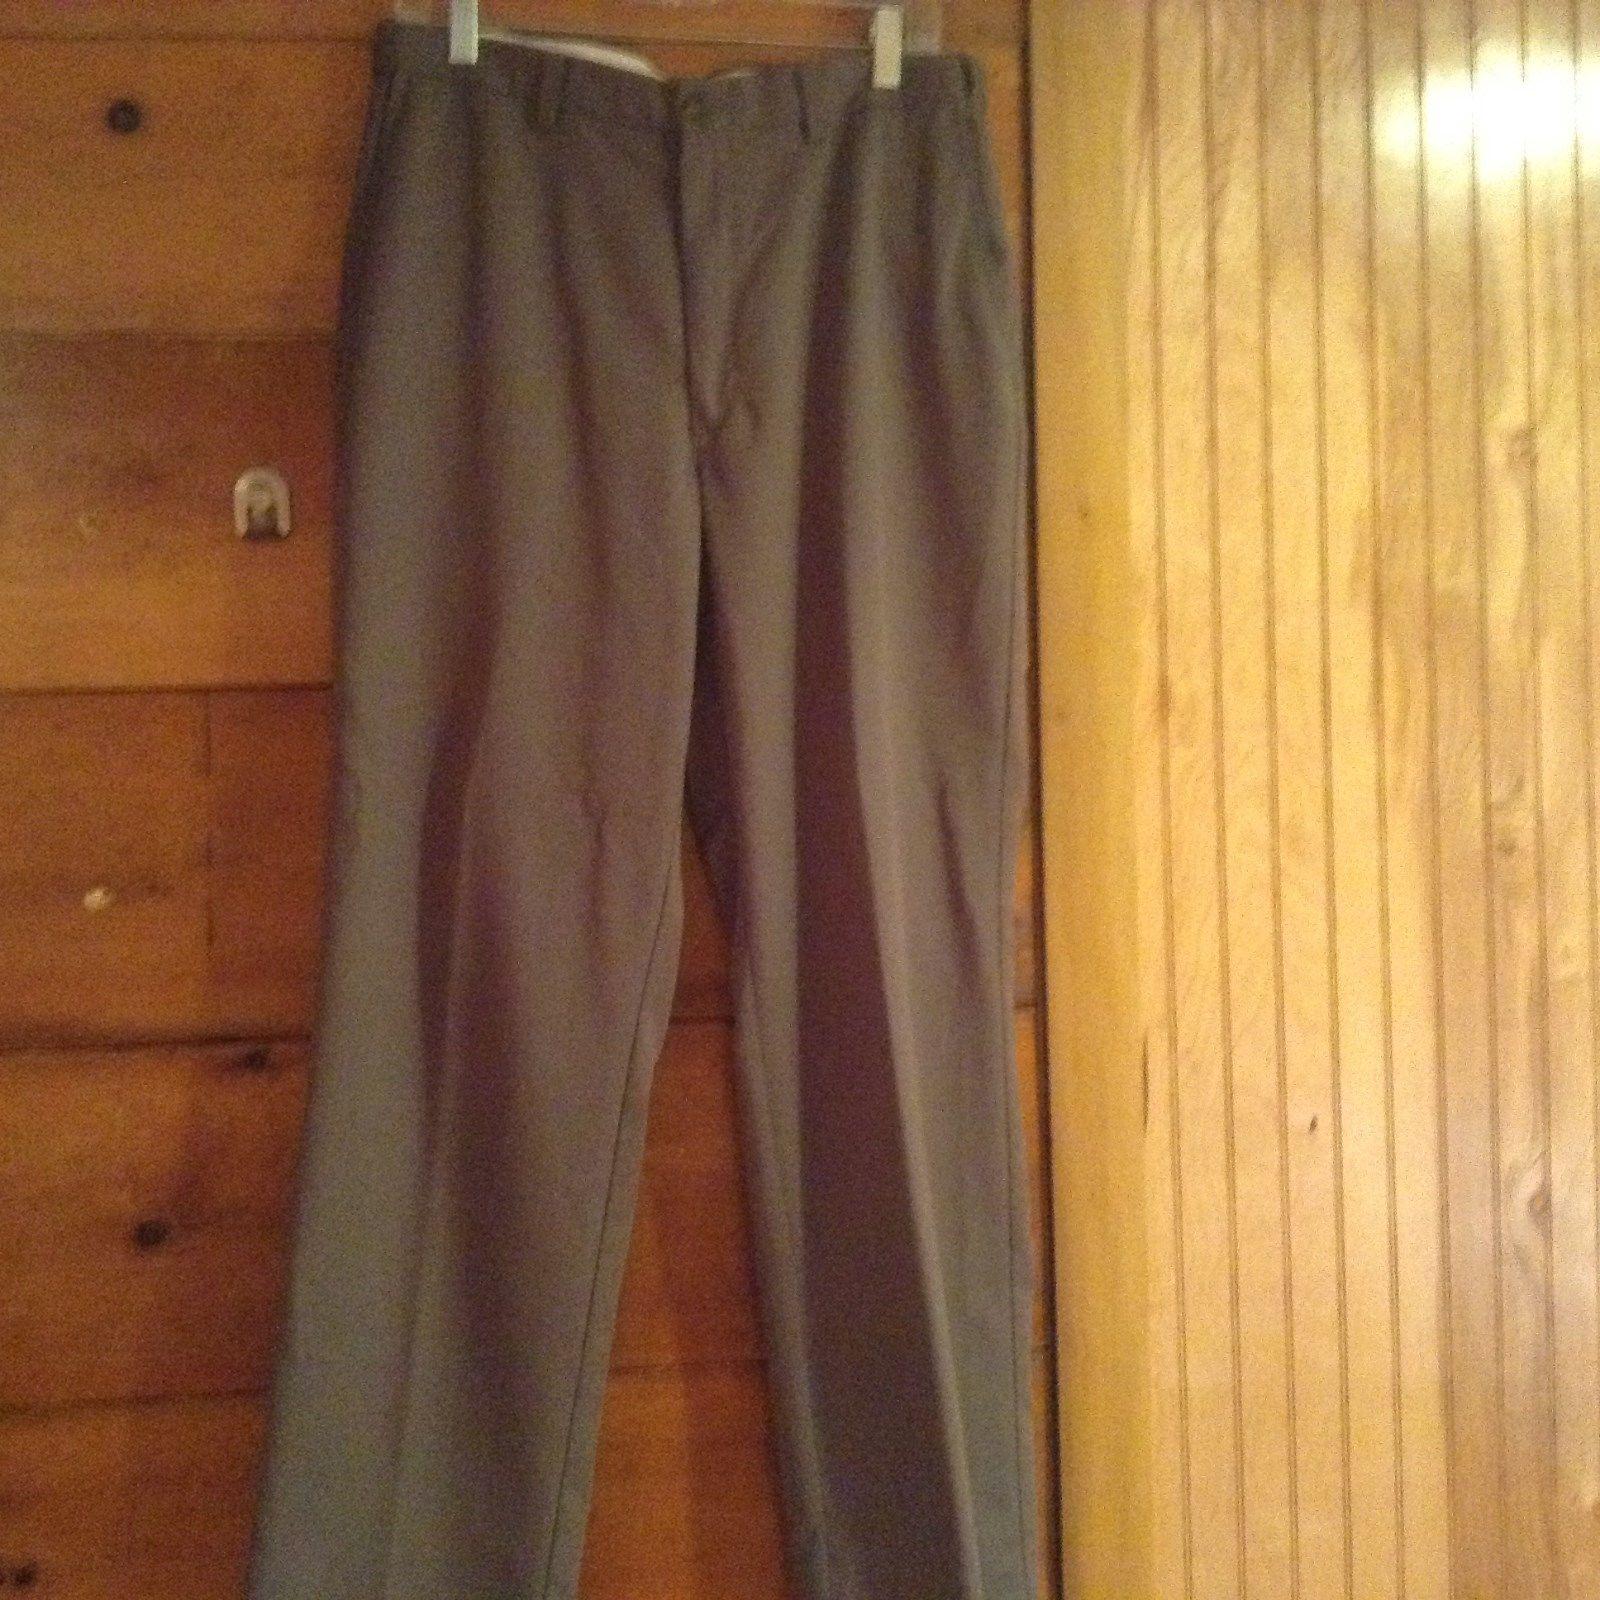 Haggar Size 34 x 32 Brown Dress Pants Button Zipper Closure Front Back Pockets